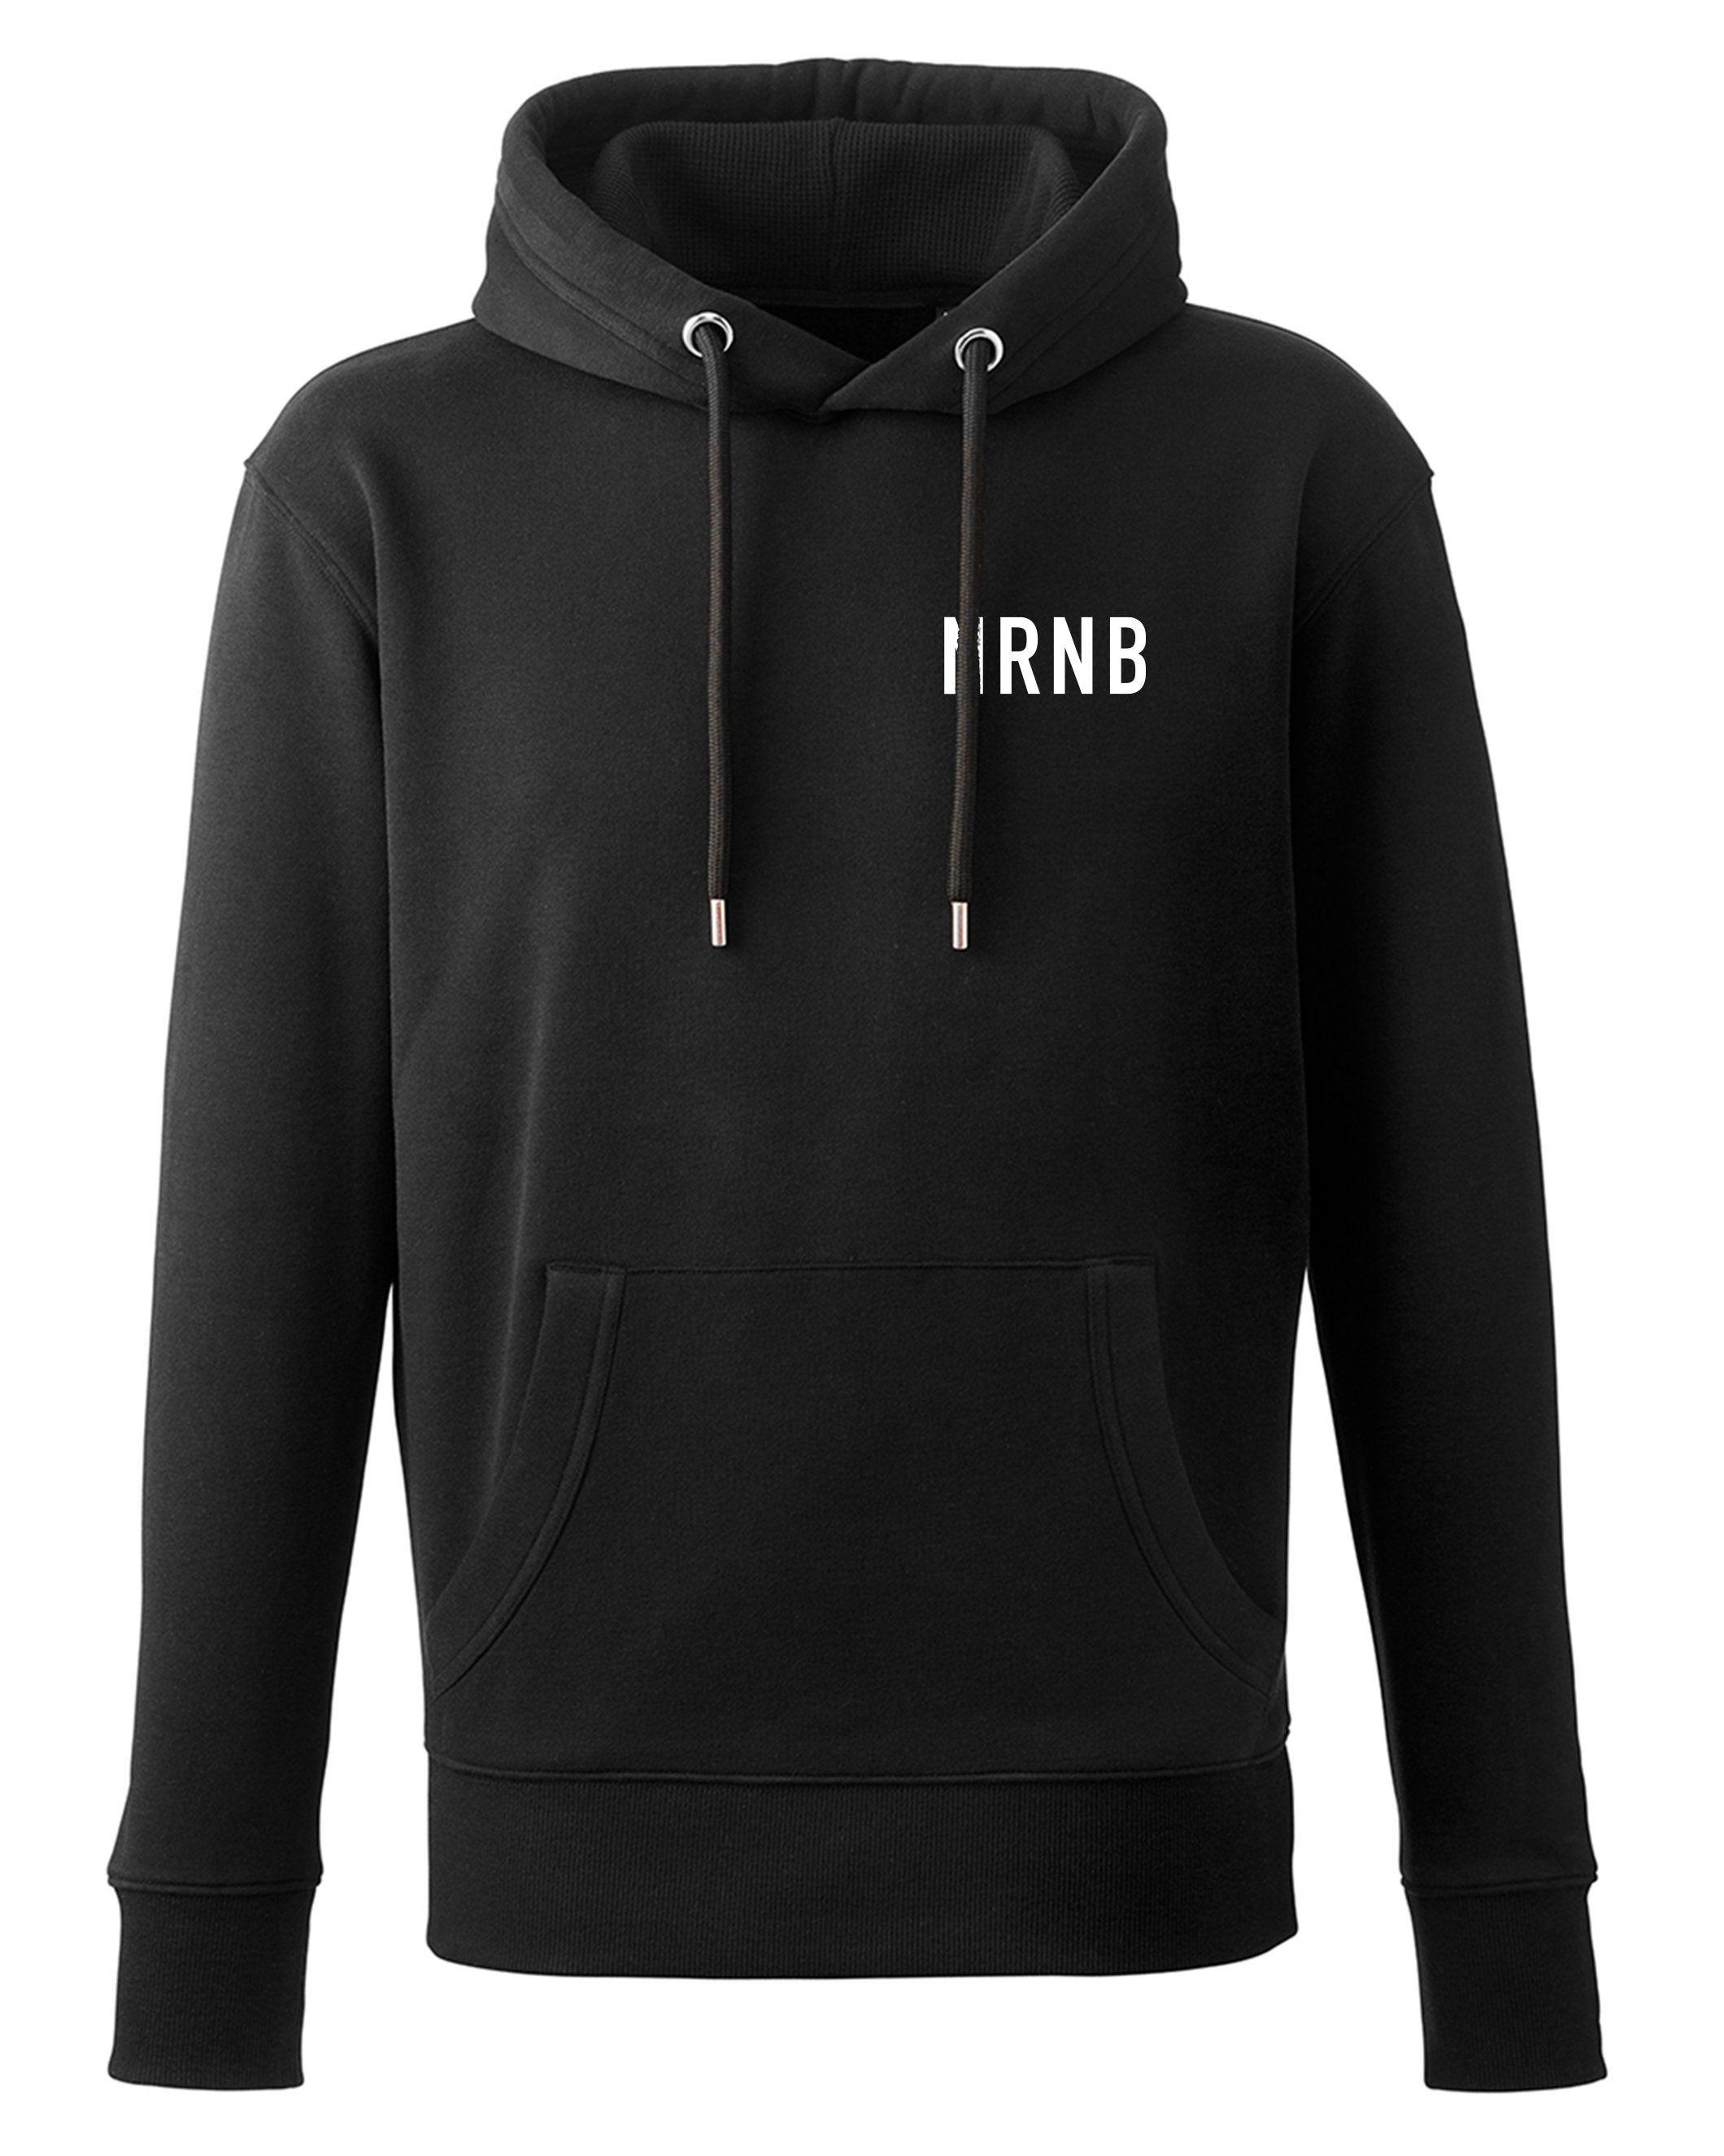 White Label Hood - Black